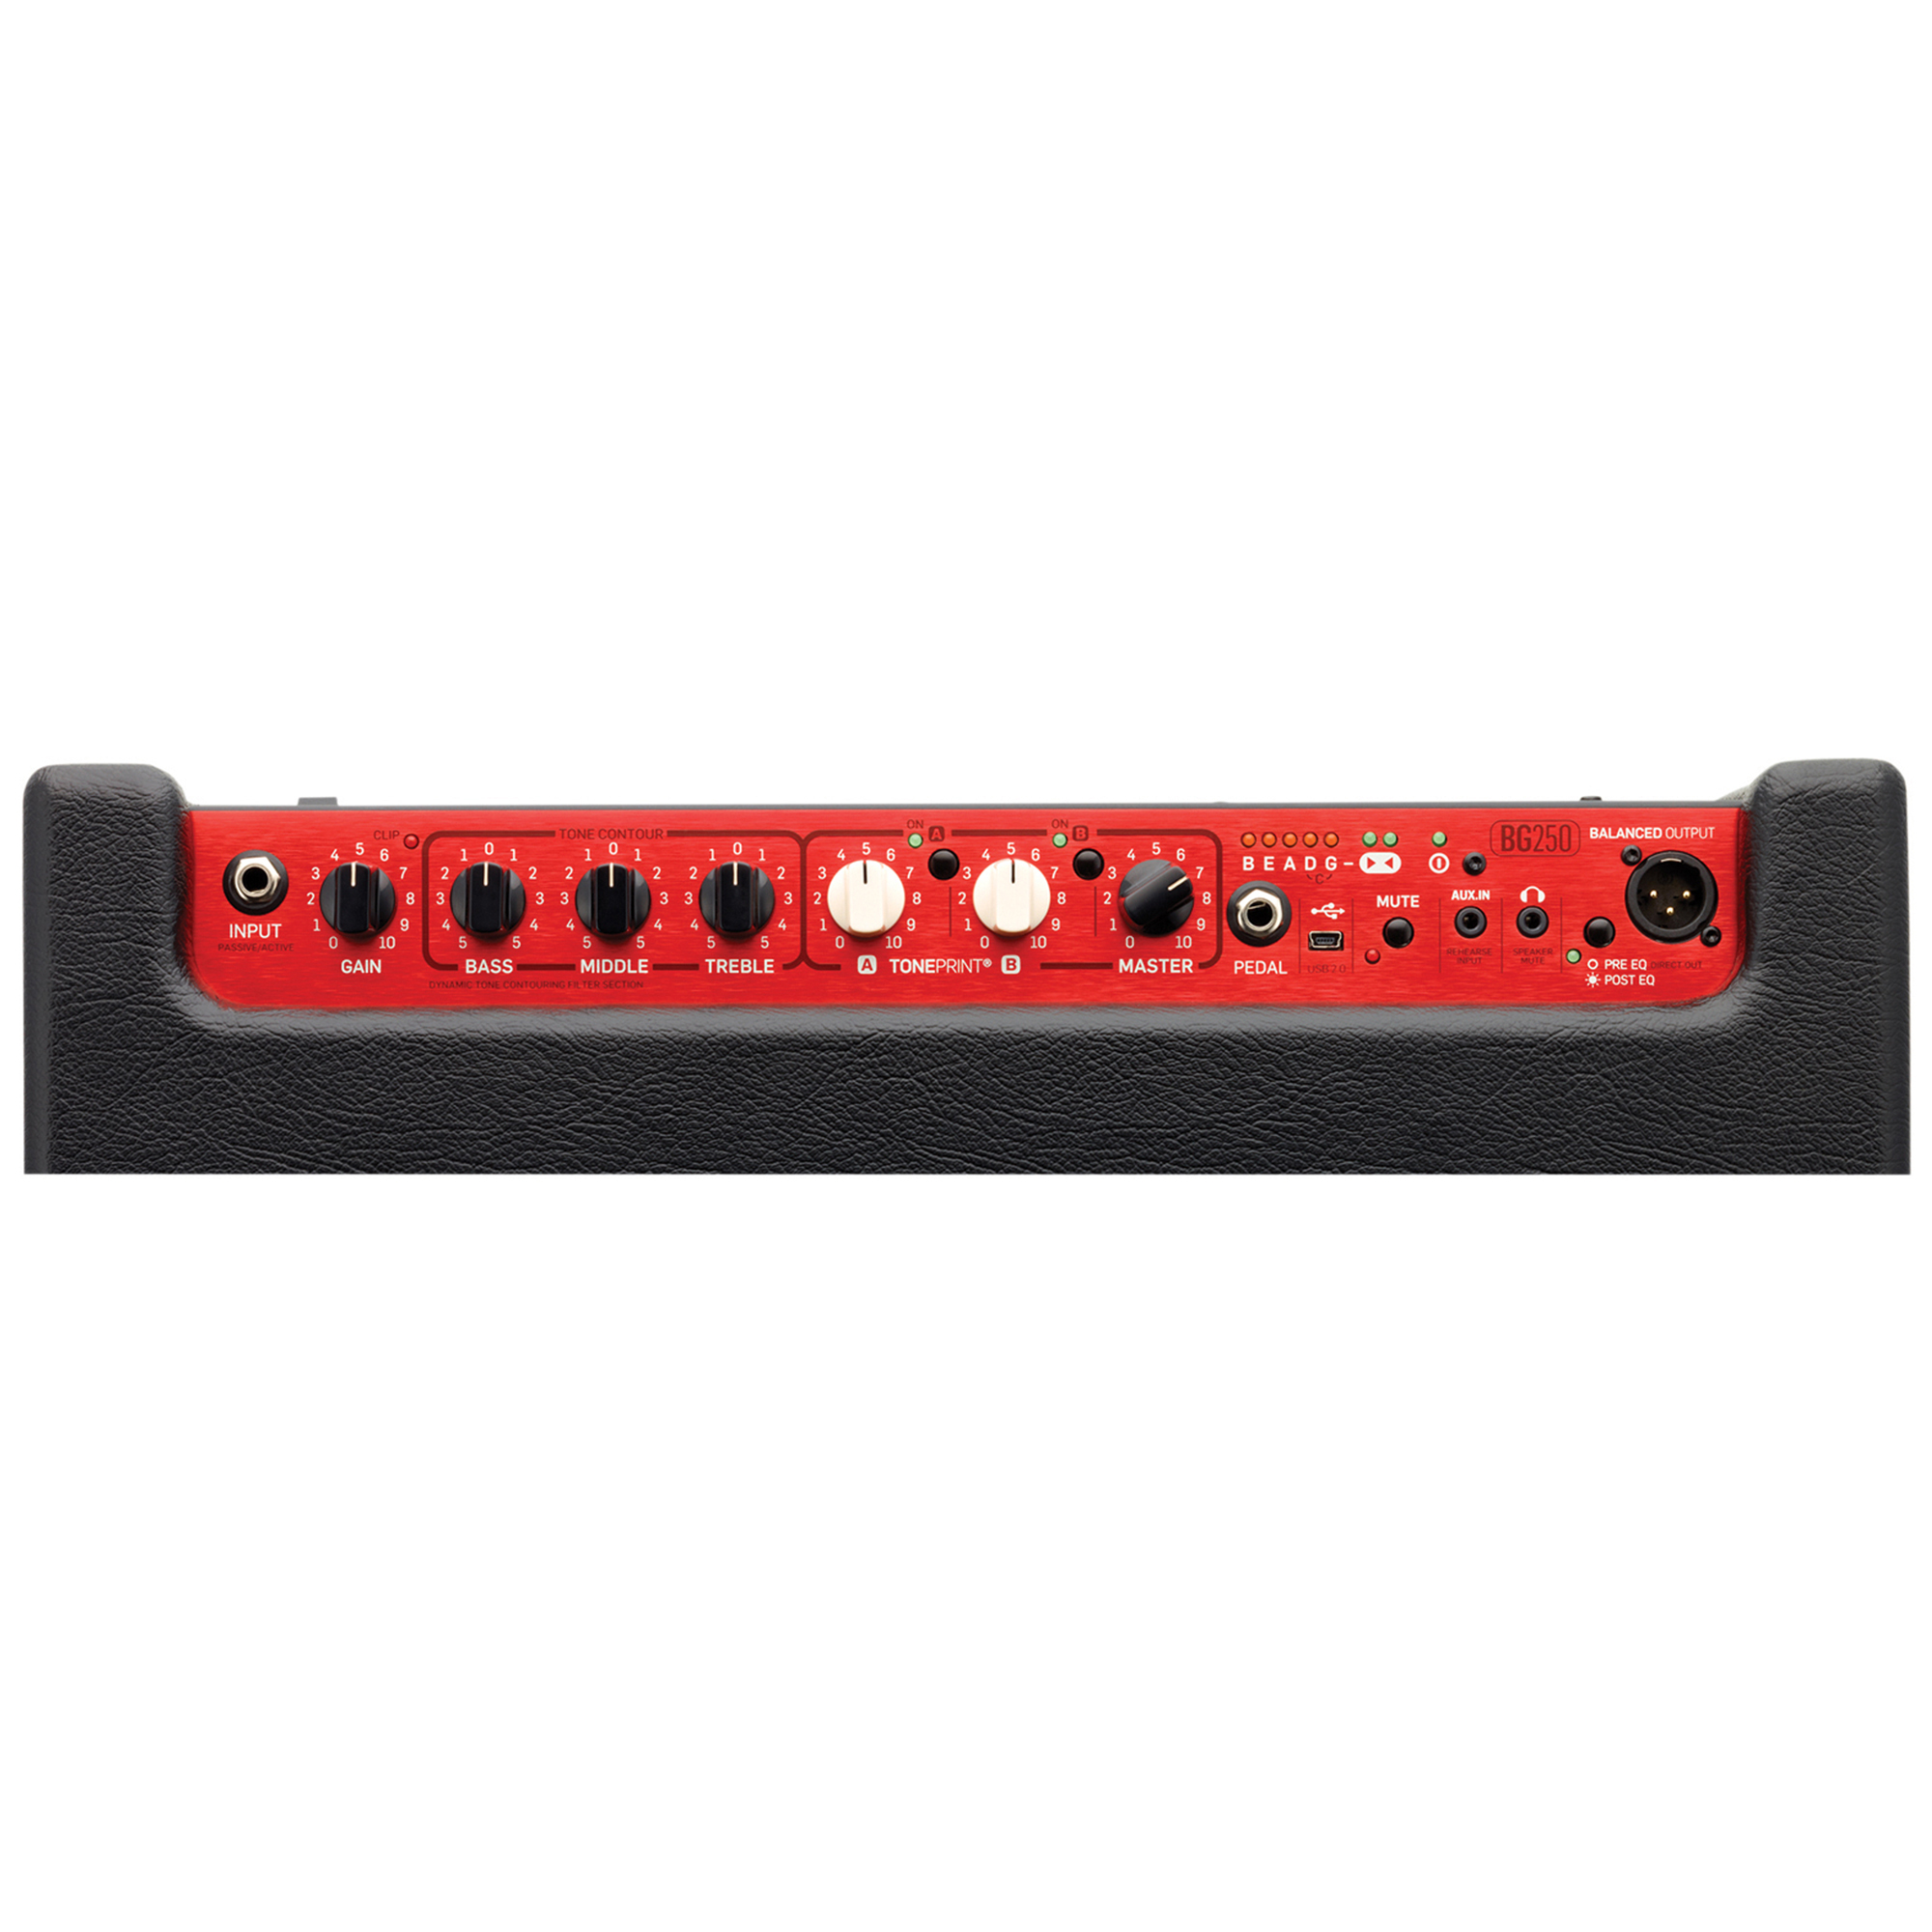 tc electronic tc068 bg250 210 bass guitar combo. Black Bedroom Furniture Sets. Home Design Ideas